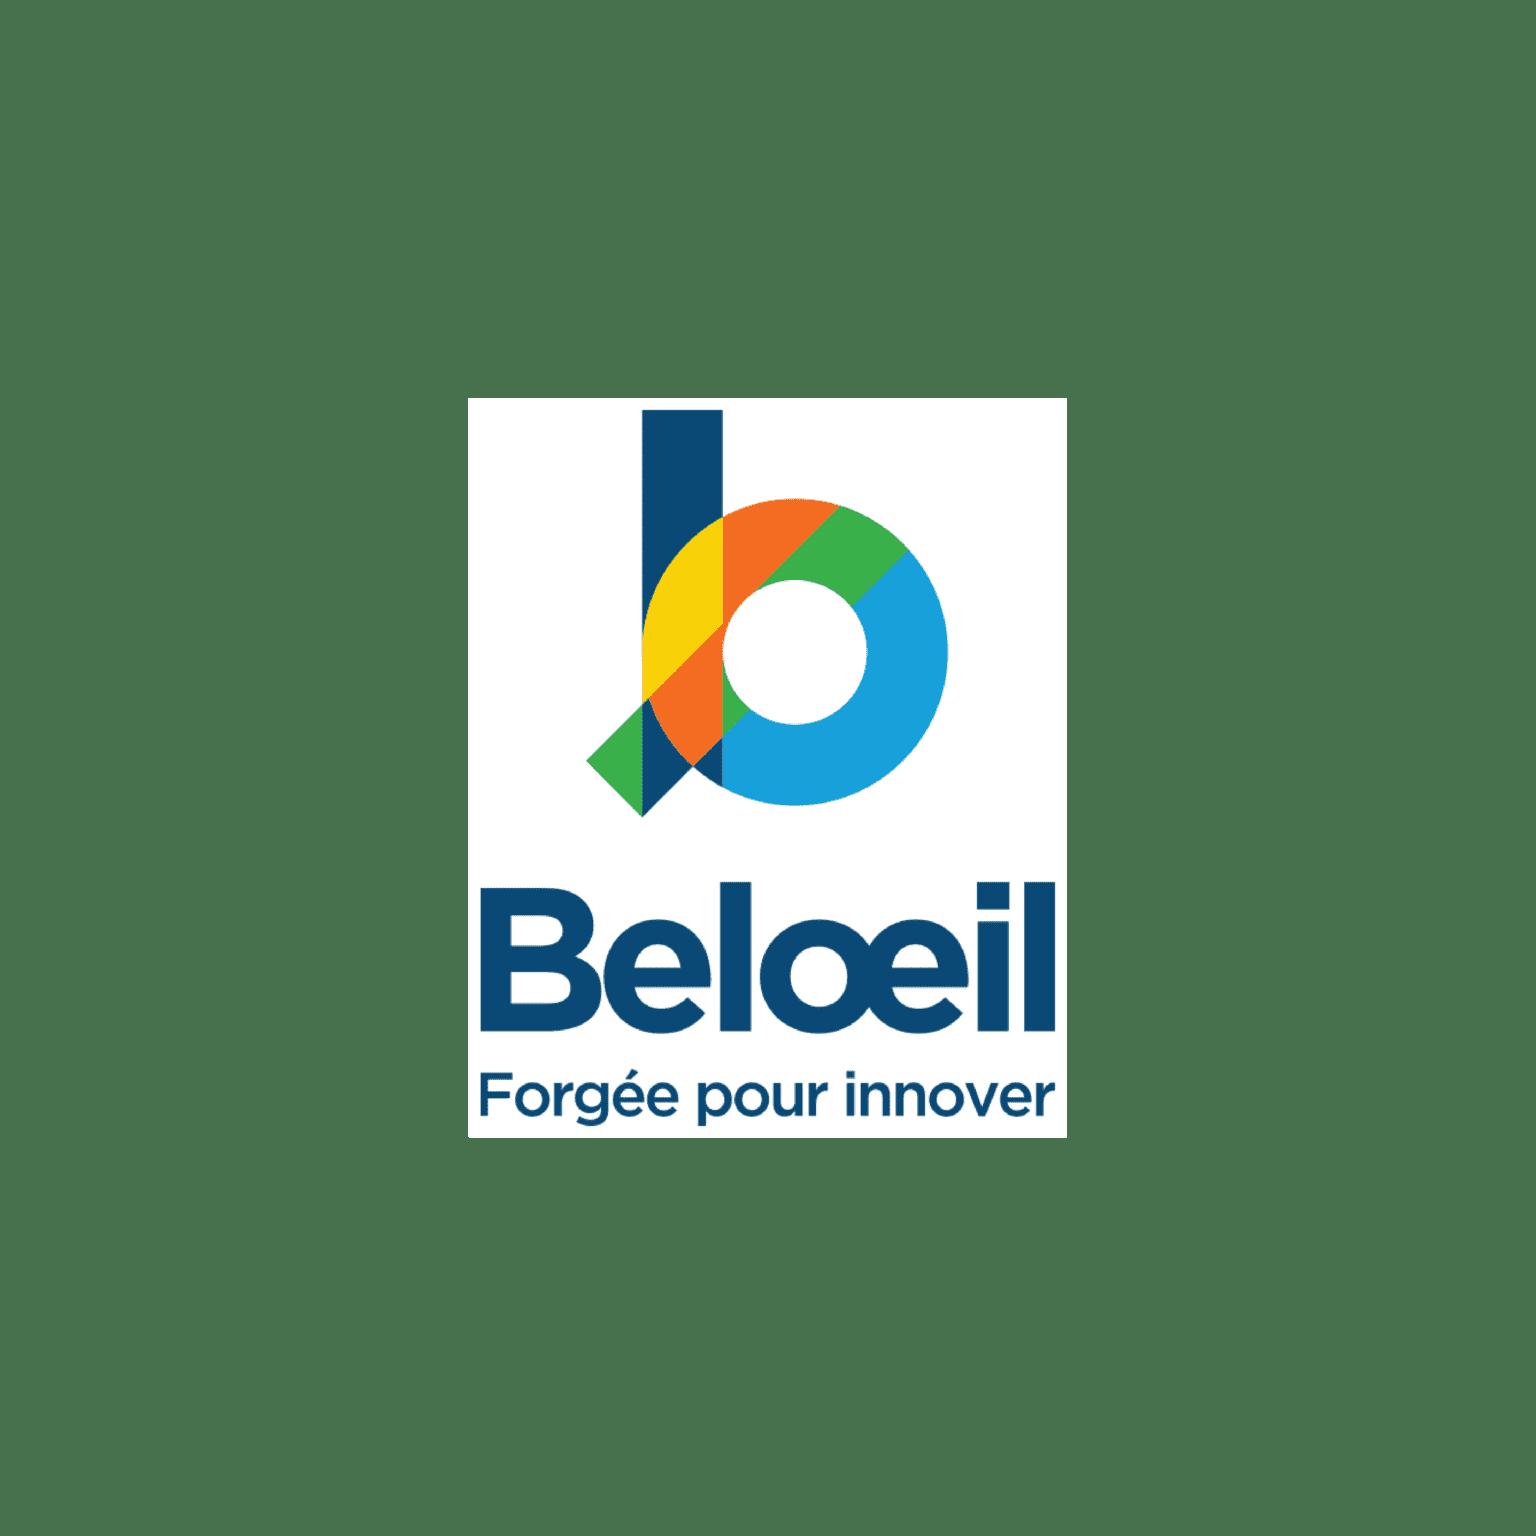 VilleBeloeil